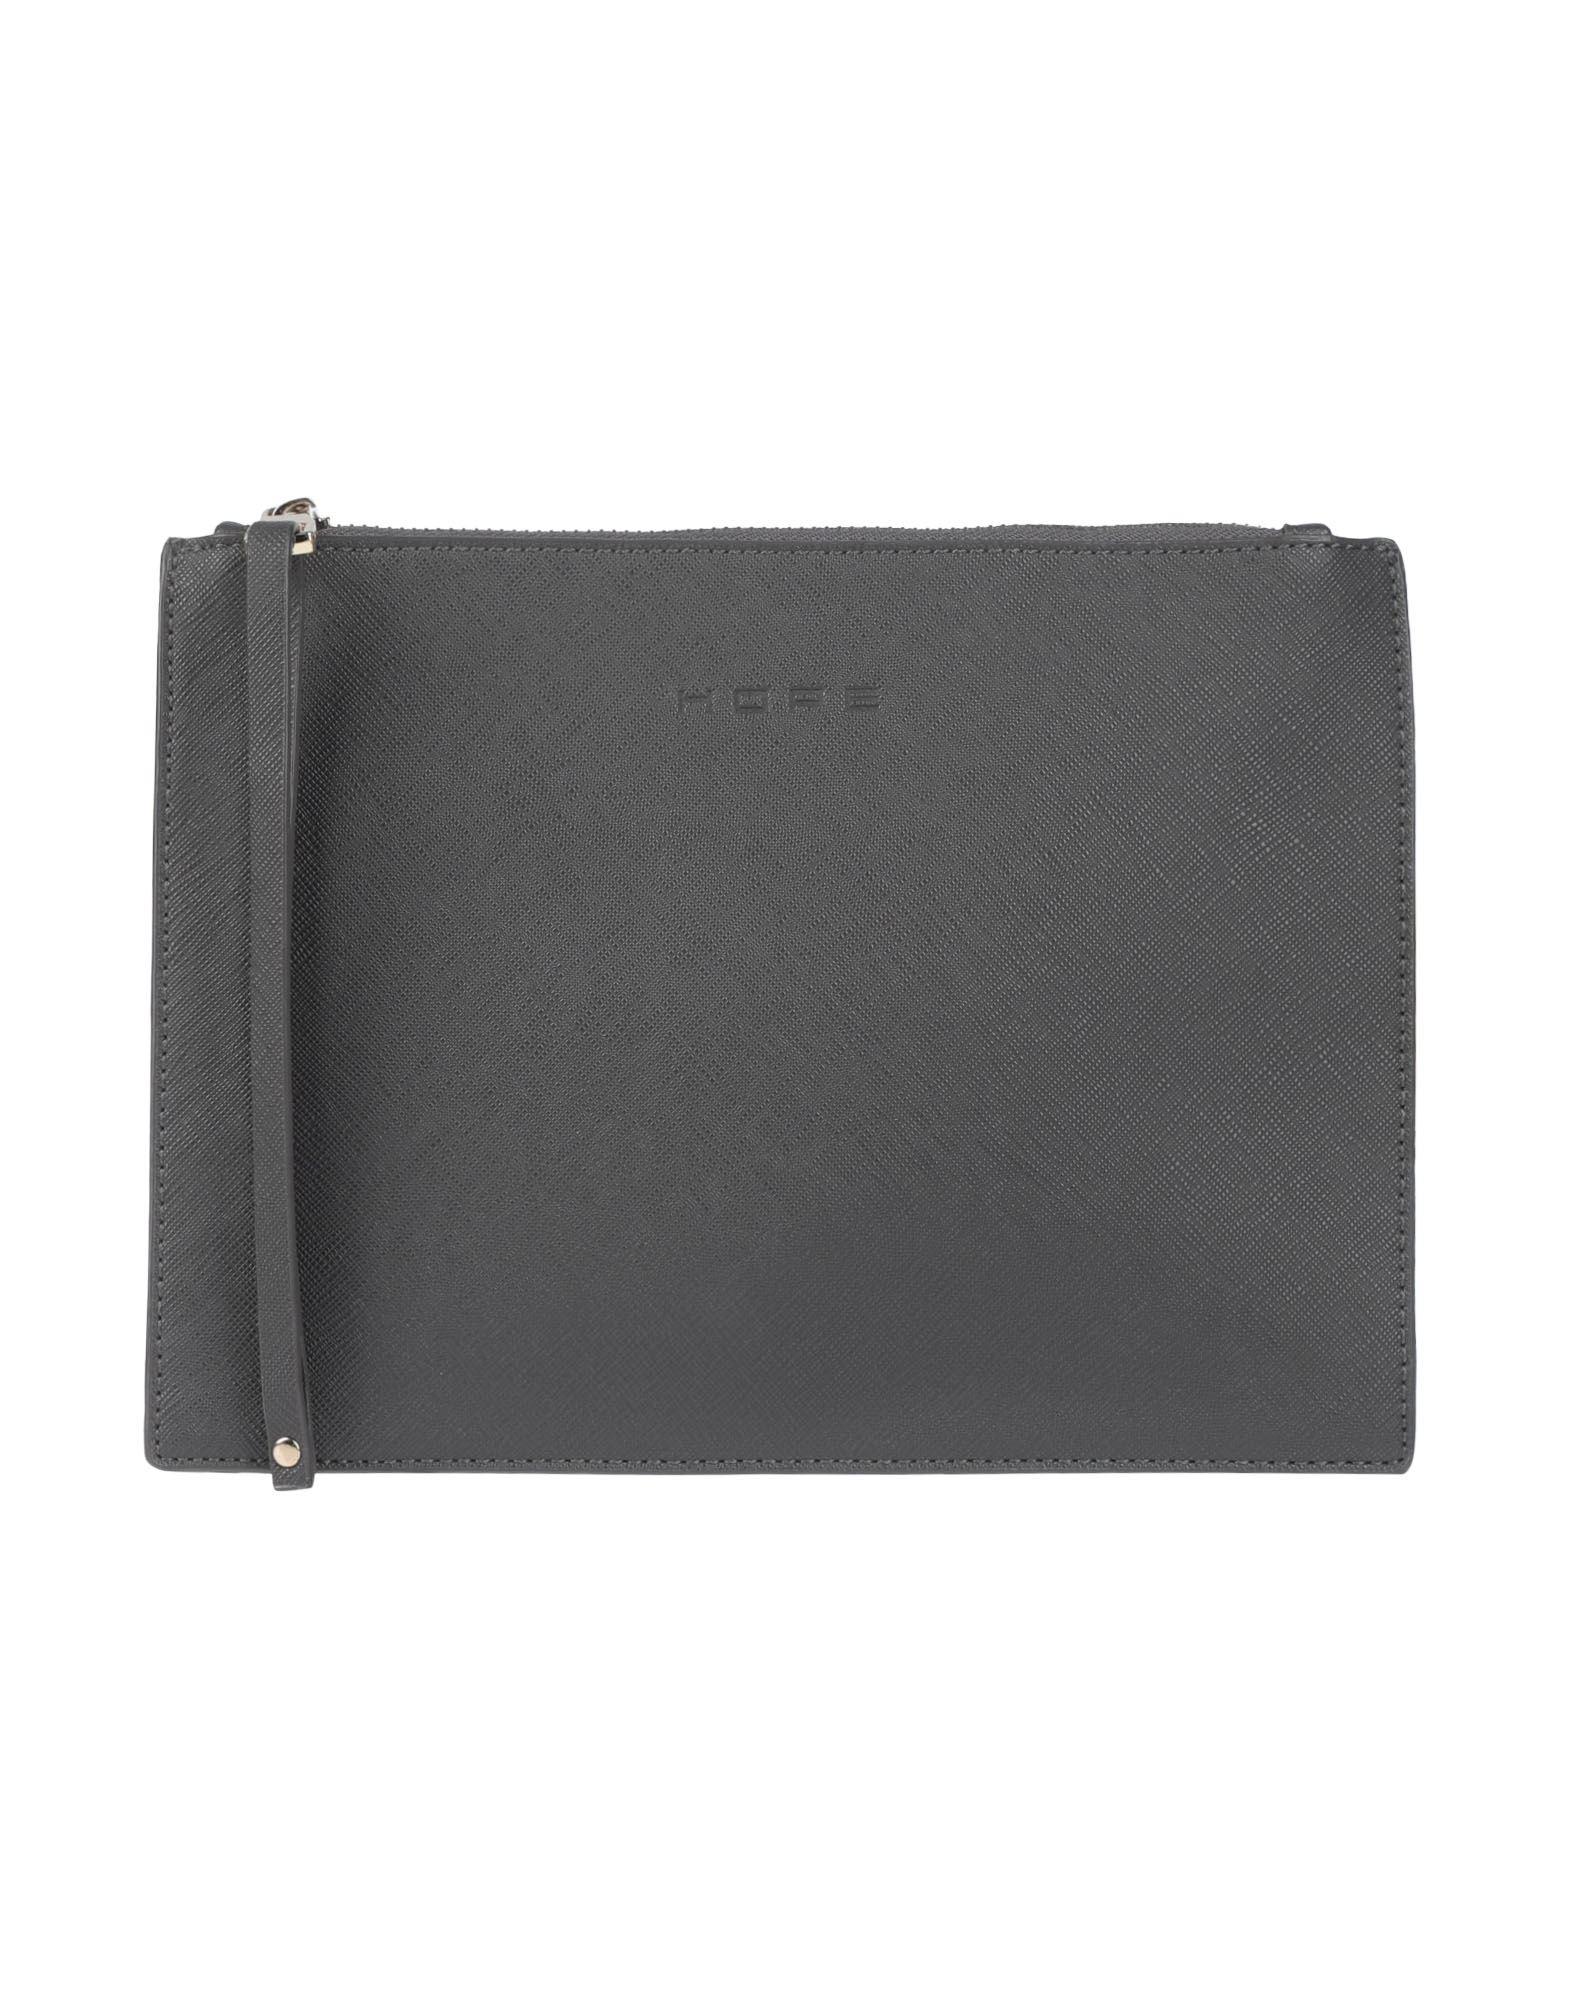 HOPE COLLECTION Handbags - Item 45376716